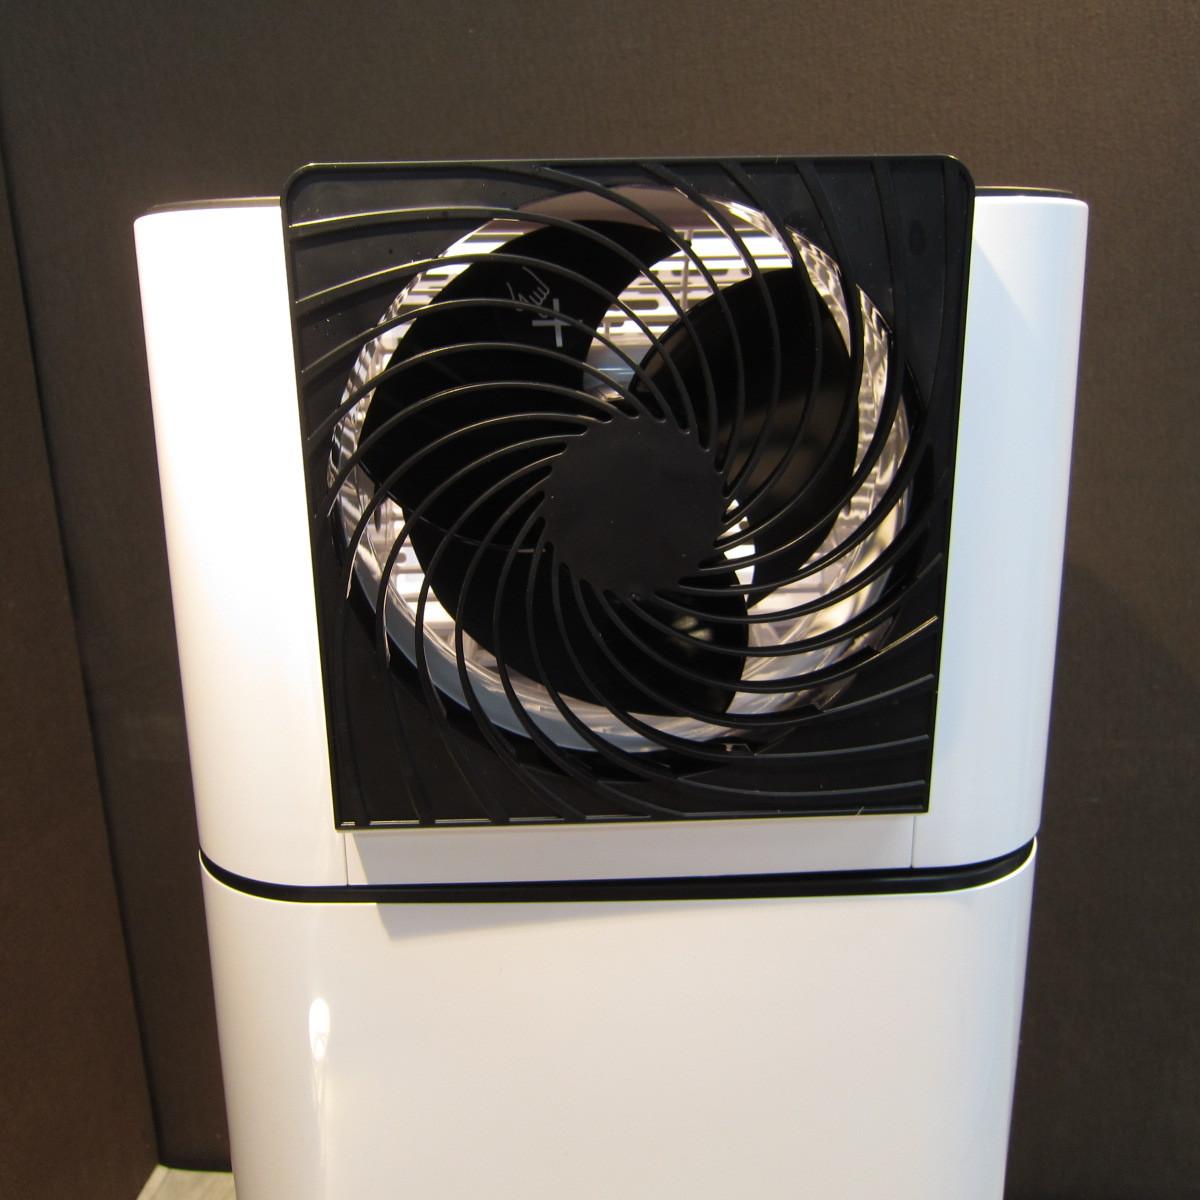 S6081【未使用】アイリスオーヤマ 衣類乾燥除湿機 スピード乾燥 サーキュレーター機能付 デシカント式 ホワイト IJD-I50_画像6